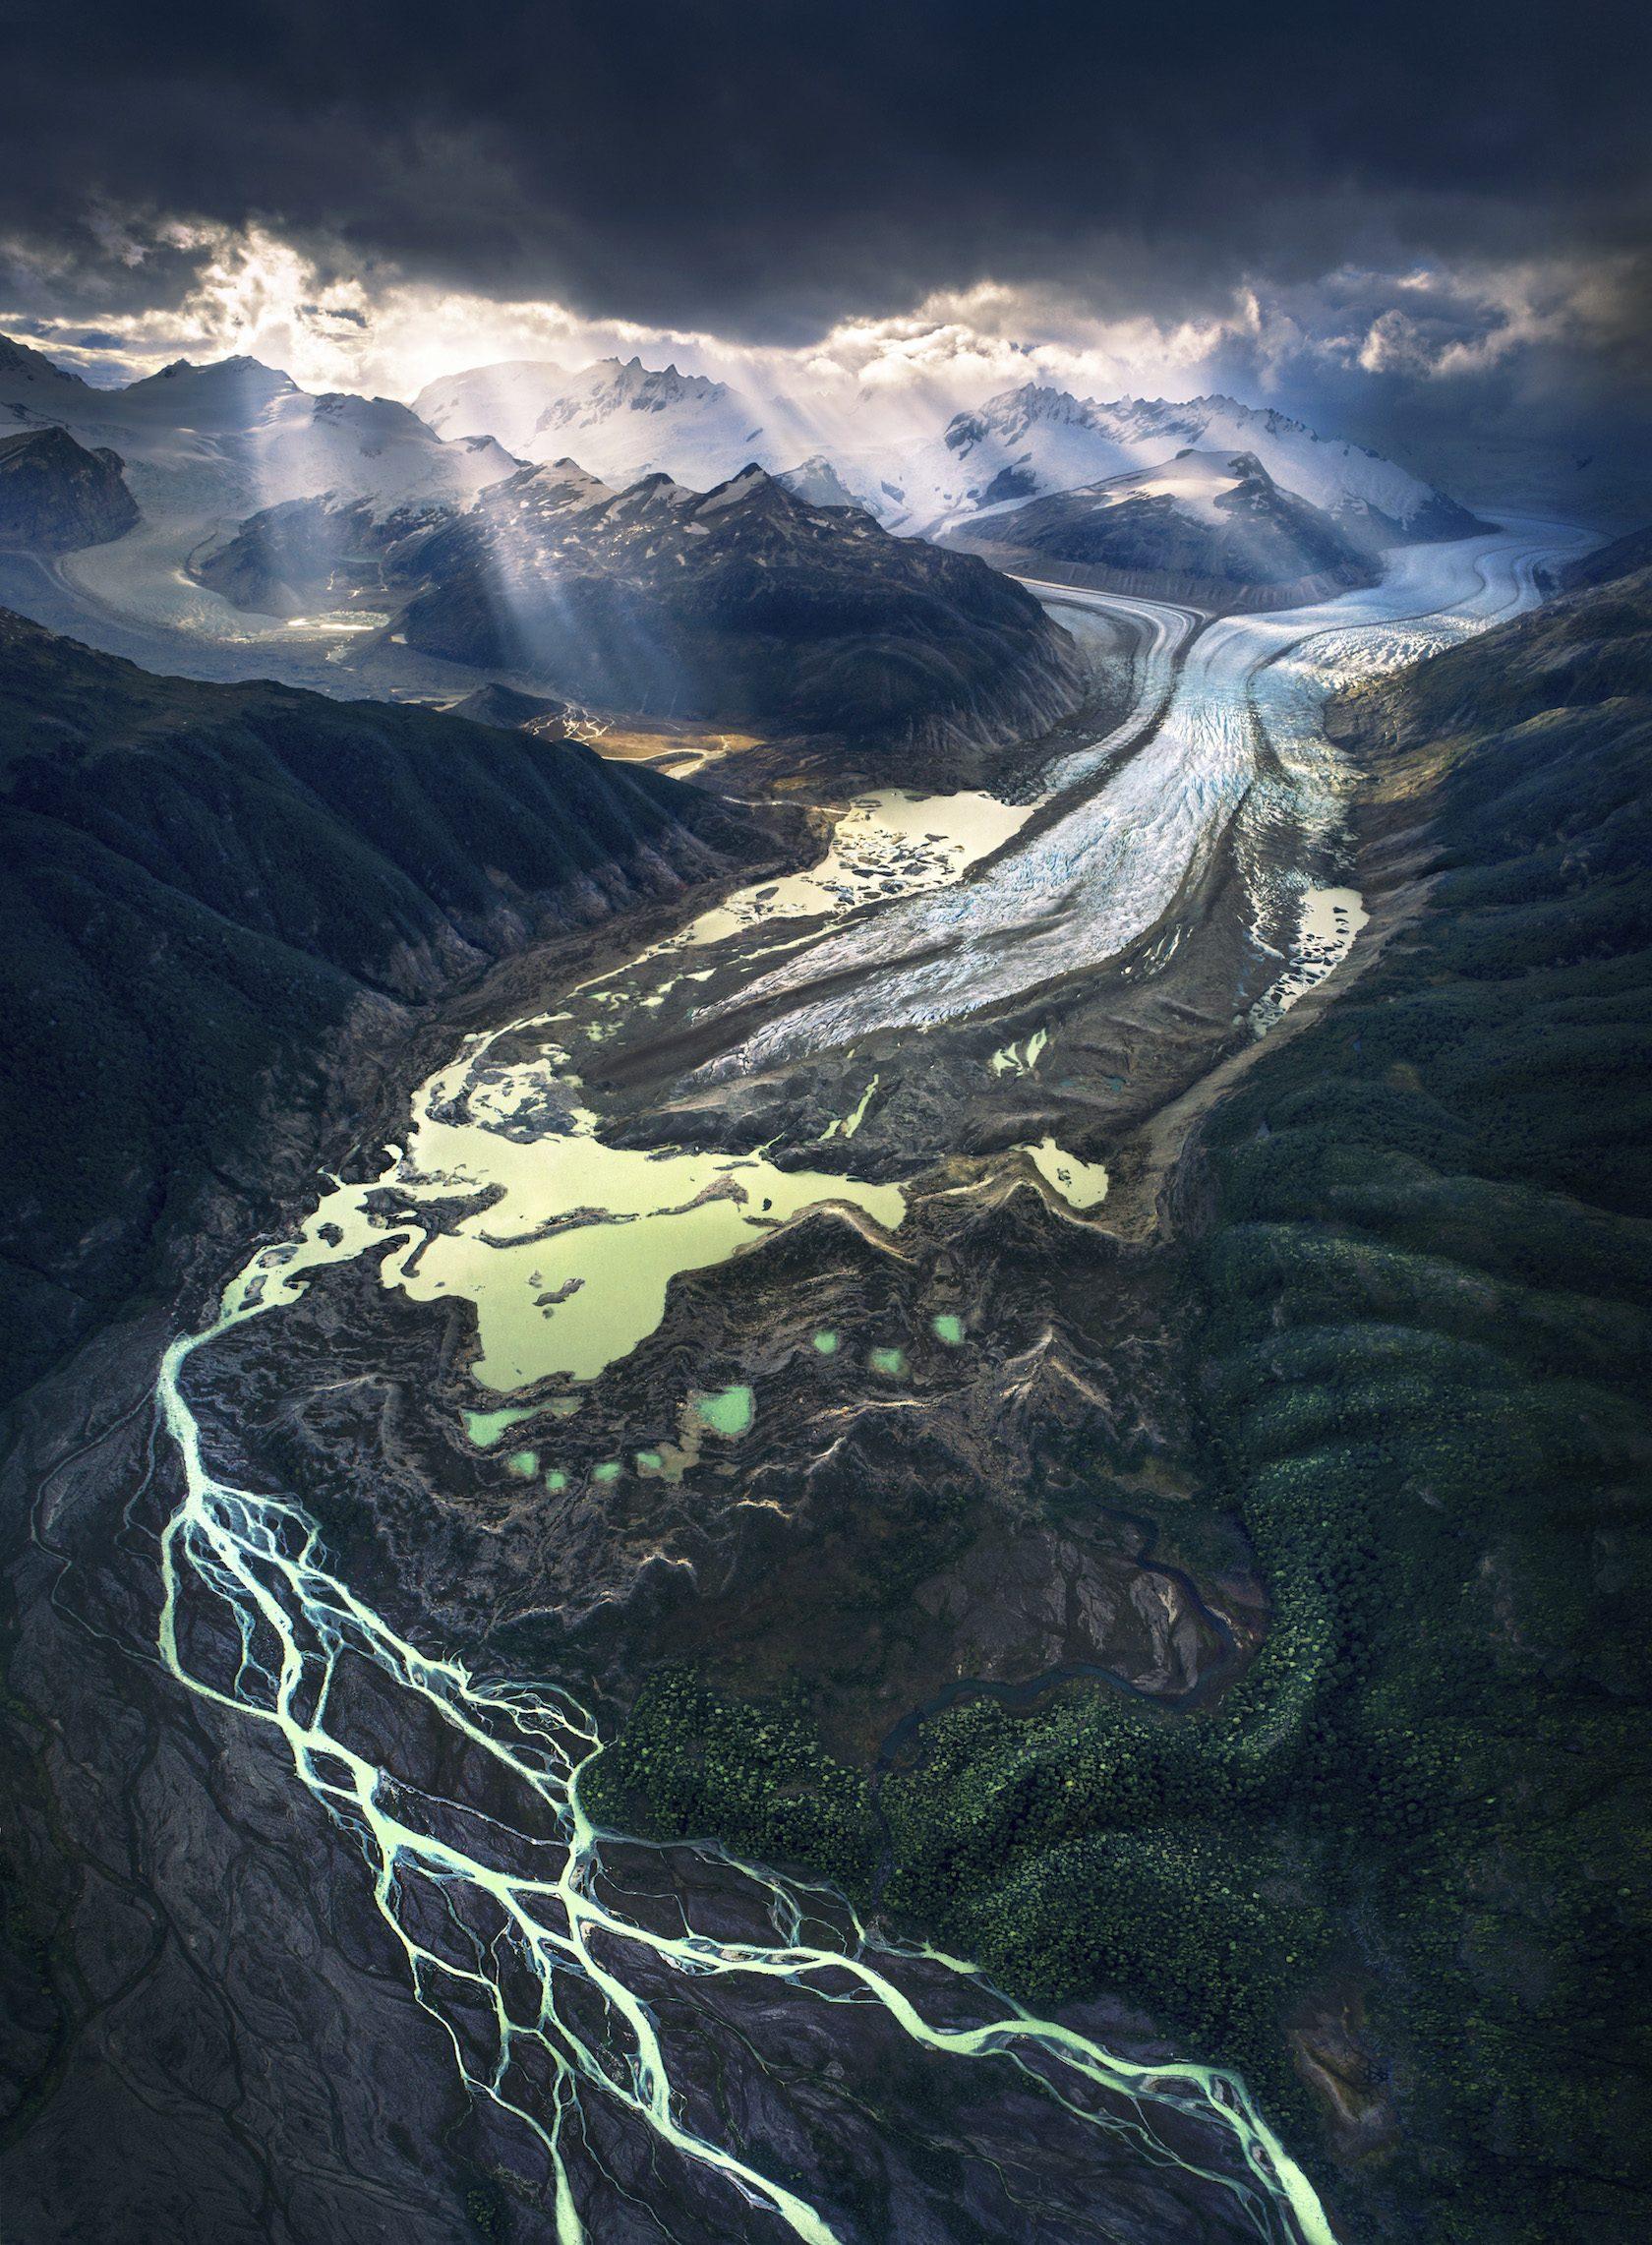 Landscape Photography Competition